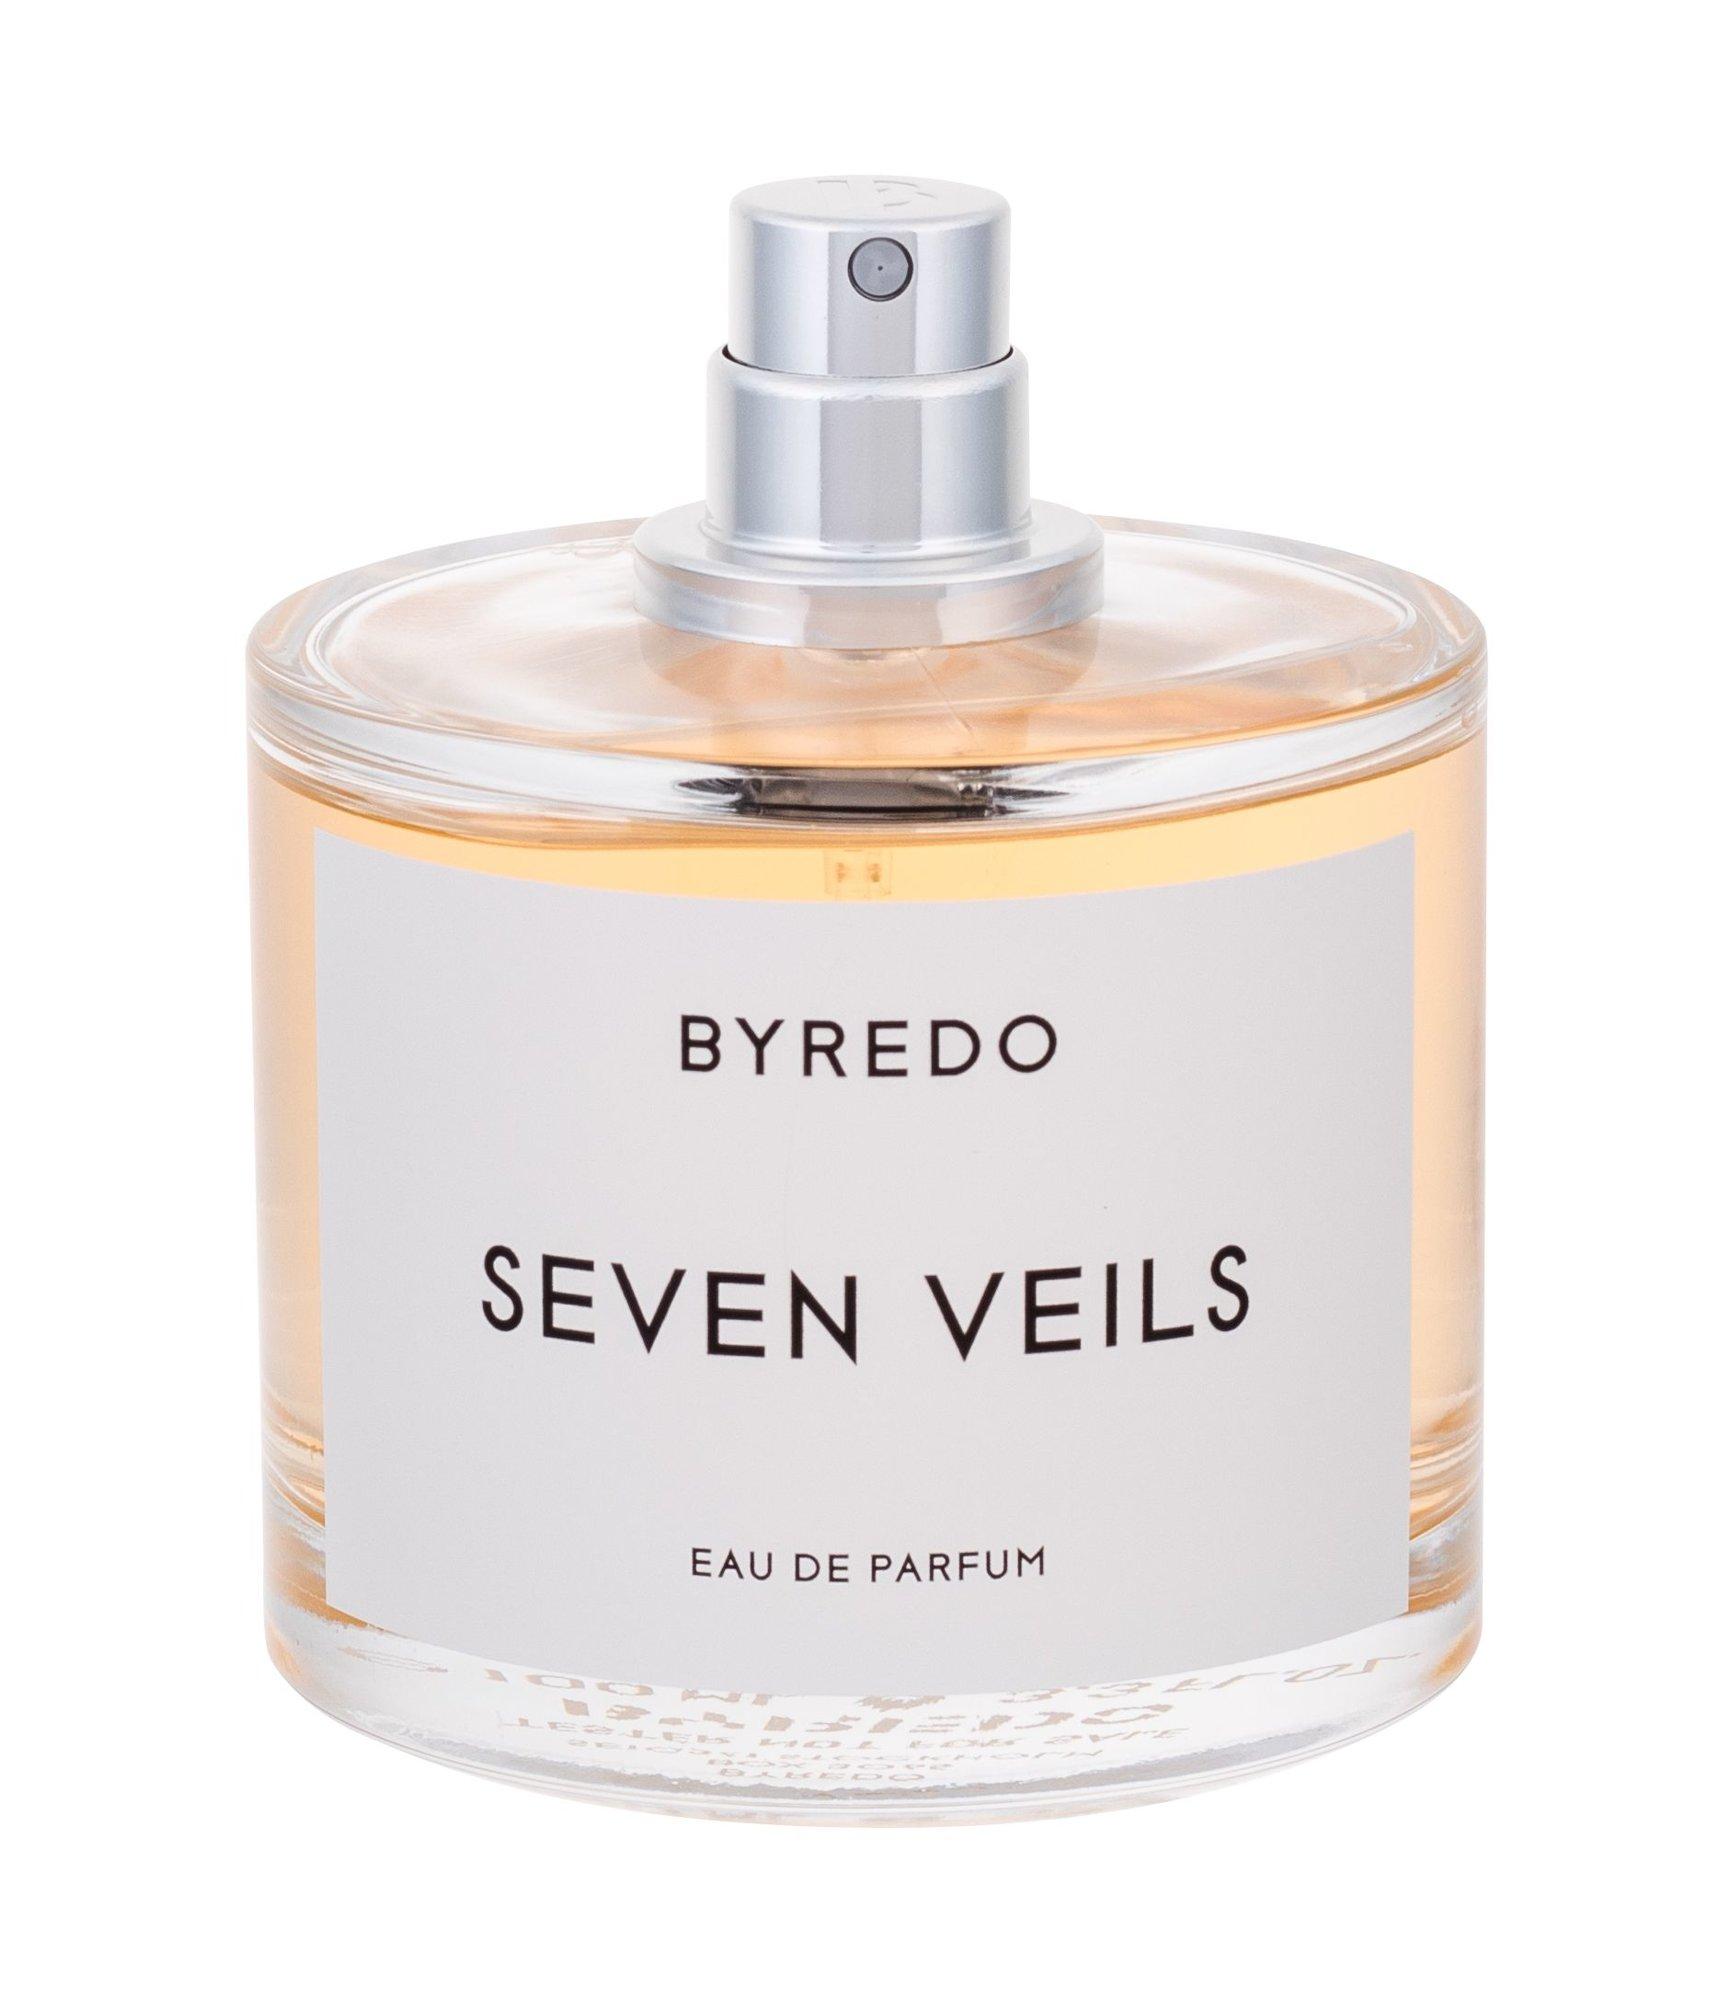 BYREDO Seven Veils Eau de Parfum 100ml